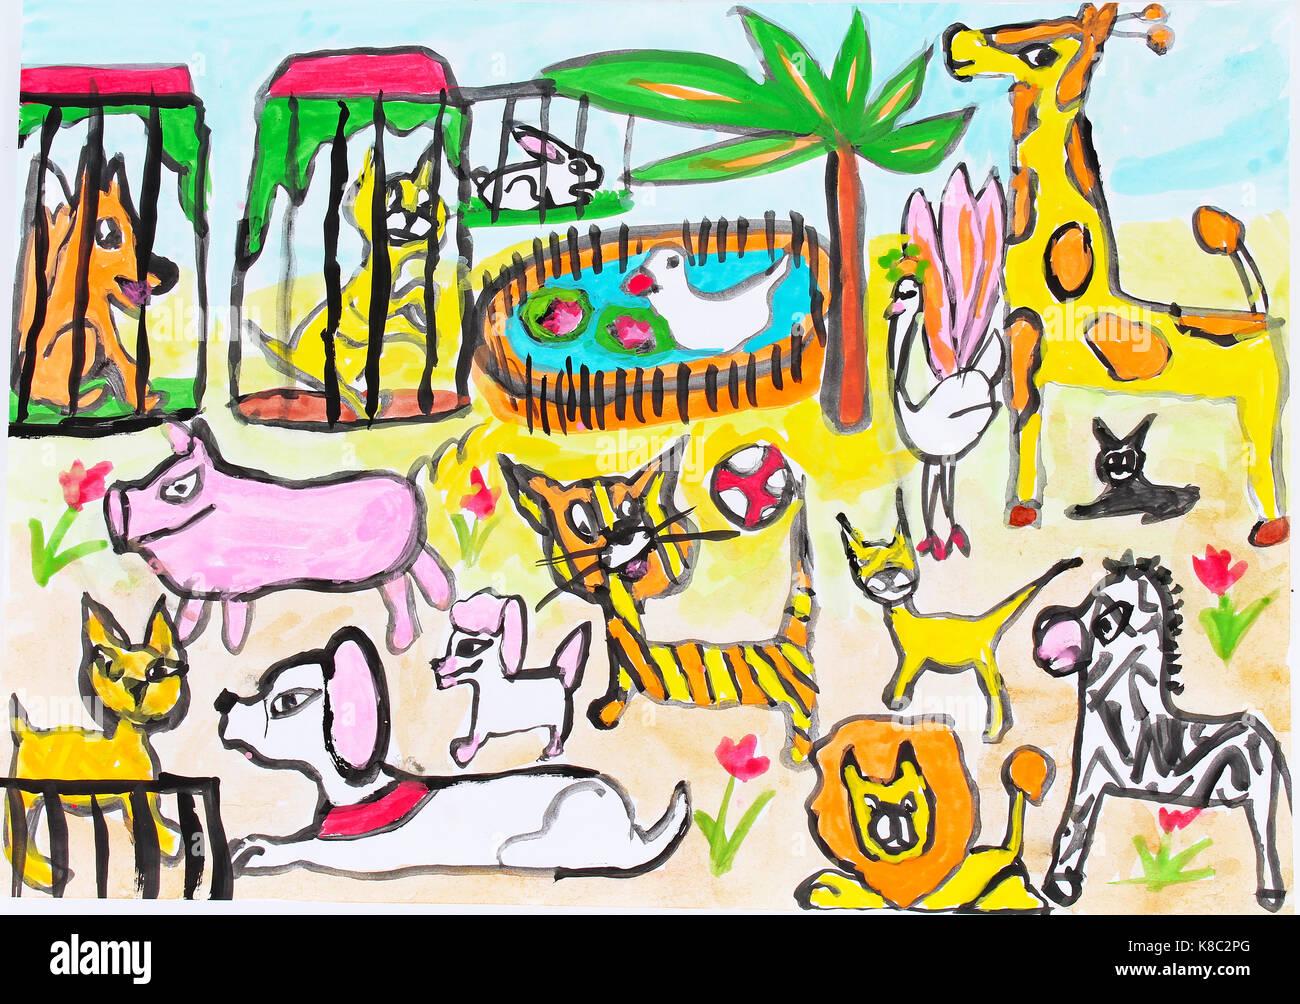 Image of: Kids Child Draw Drawing Paint Painting Zoo With Animals Giraffe Tiger Pig Dog Fox Zebra Cat Bird Lion Duck Children Draws Paints Kids Art Alamy Child Draw Drawing Paint Painting Zoo With Animals Giraffe Tiger